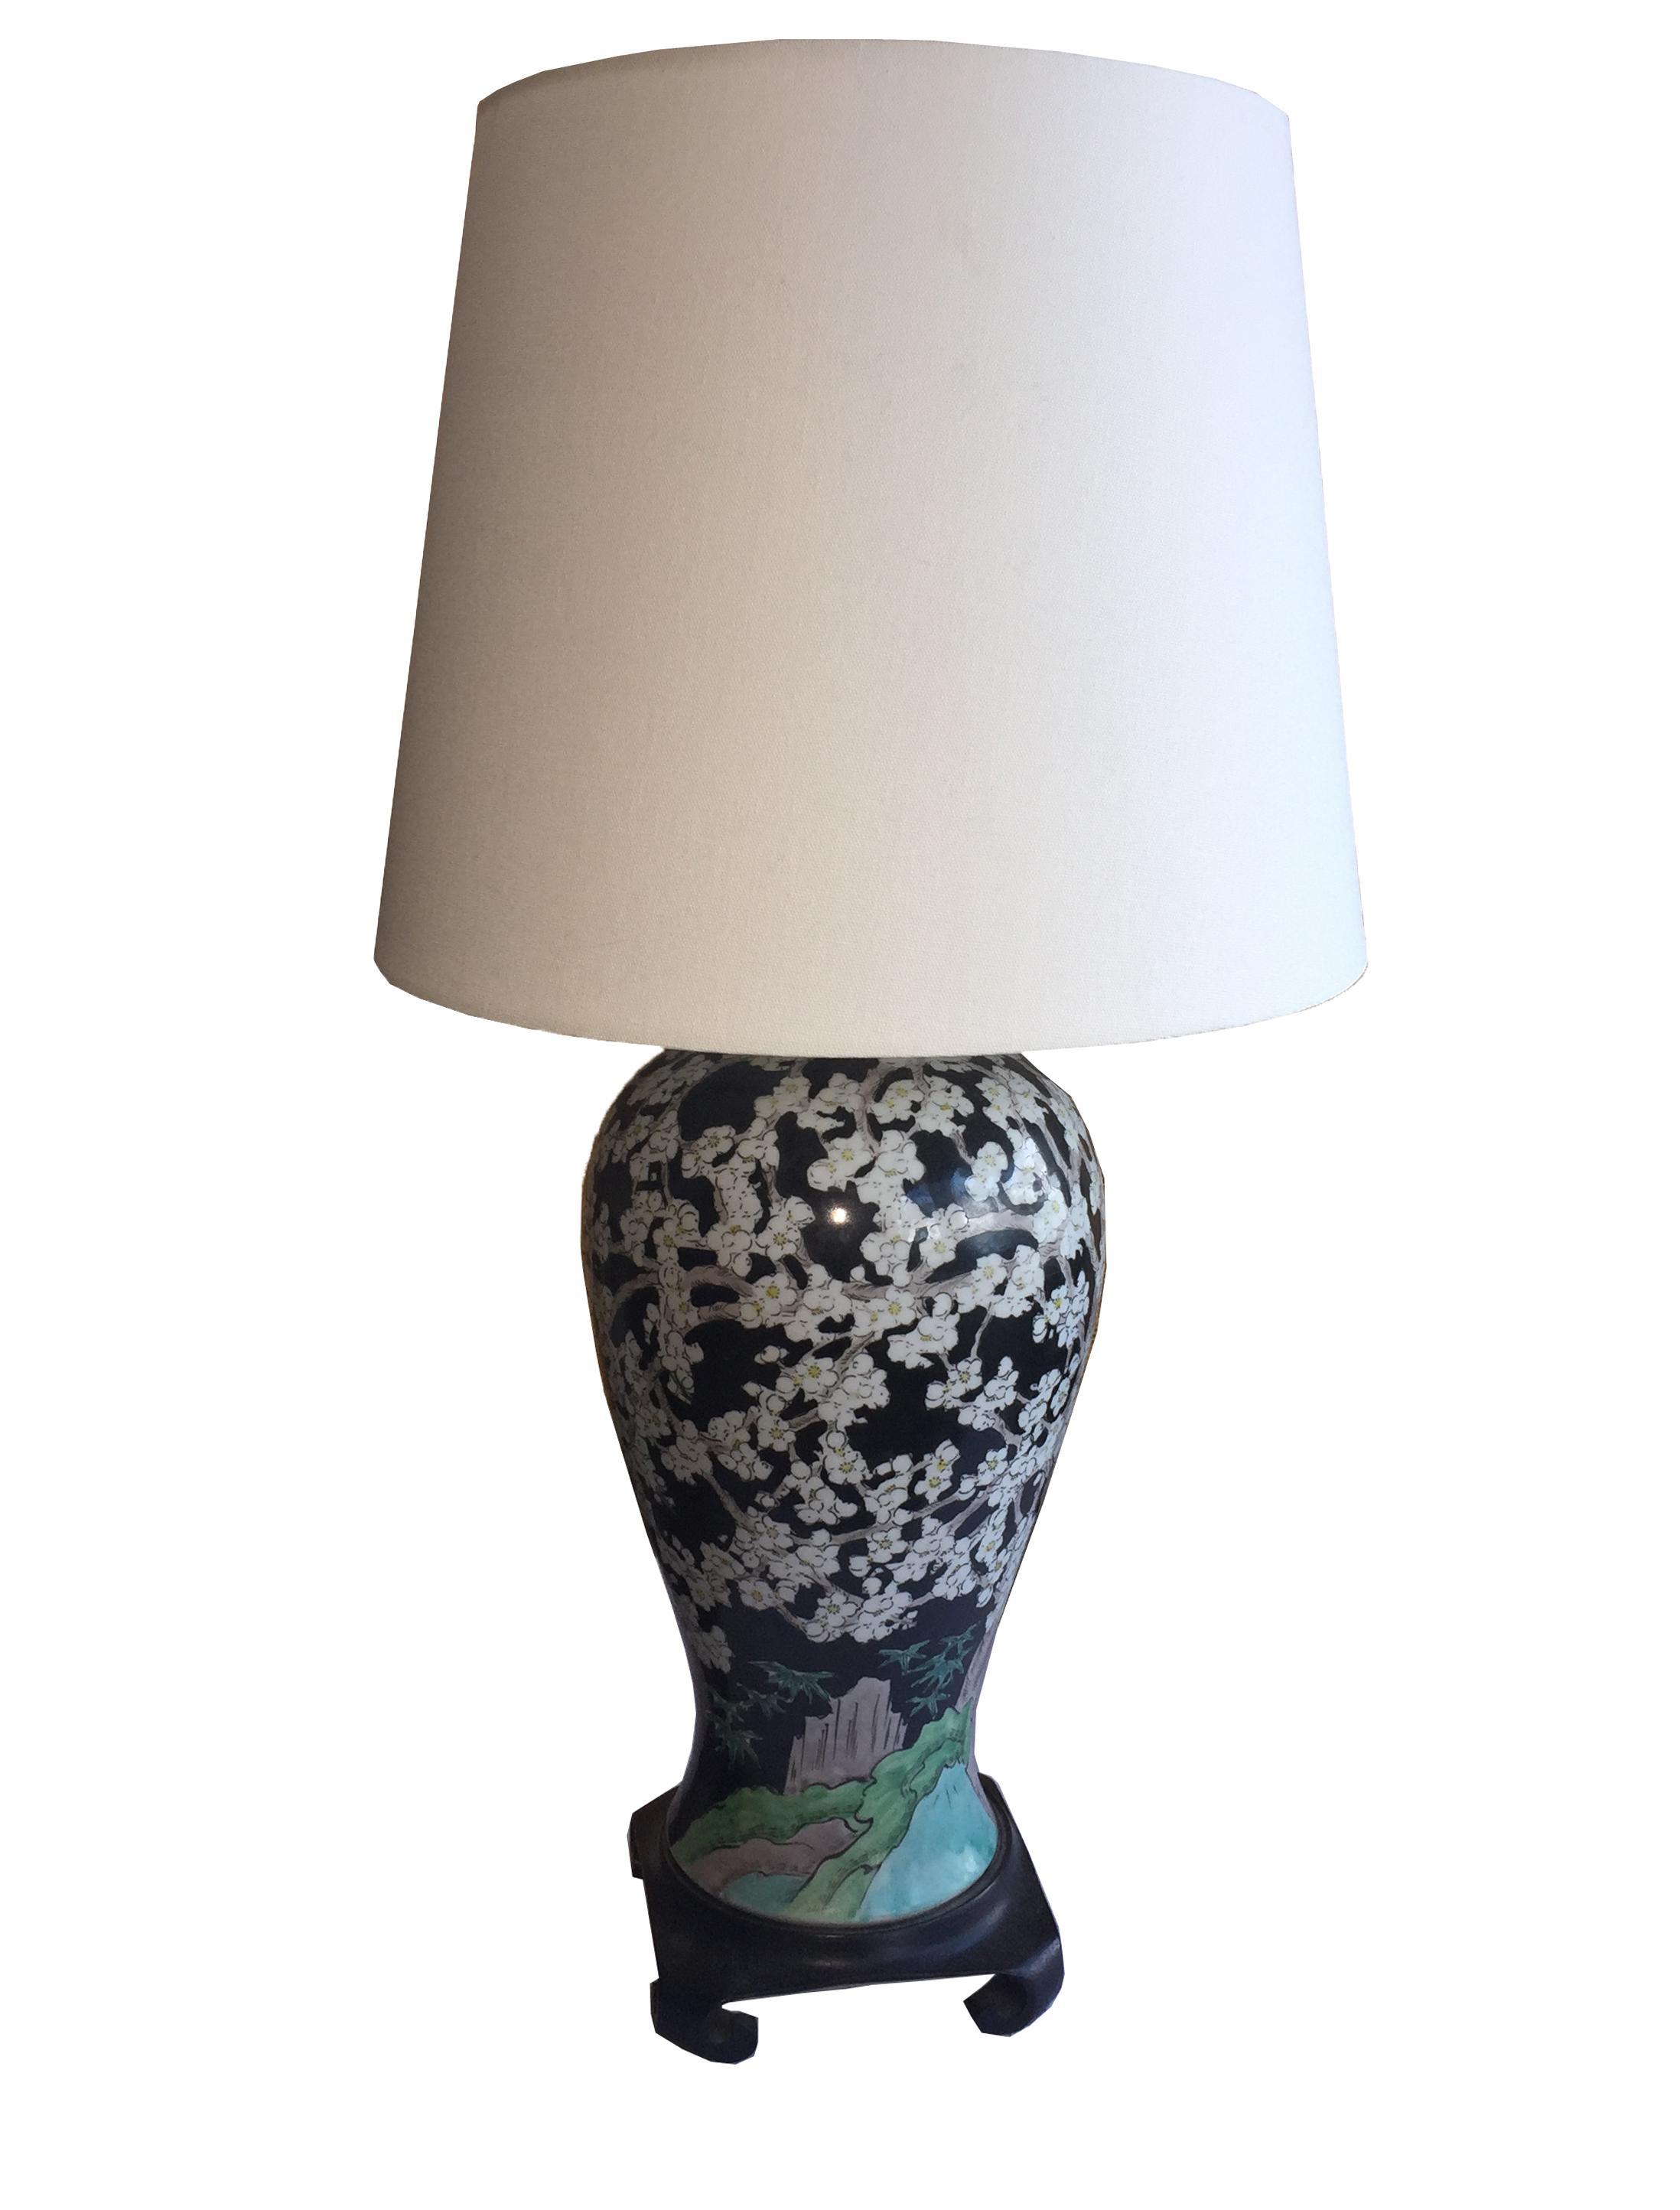 chinese famille noir vase lamp chairish. Black Bedroom Furniture Sets. Home Design Ideas